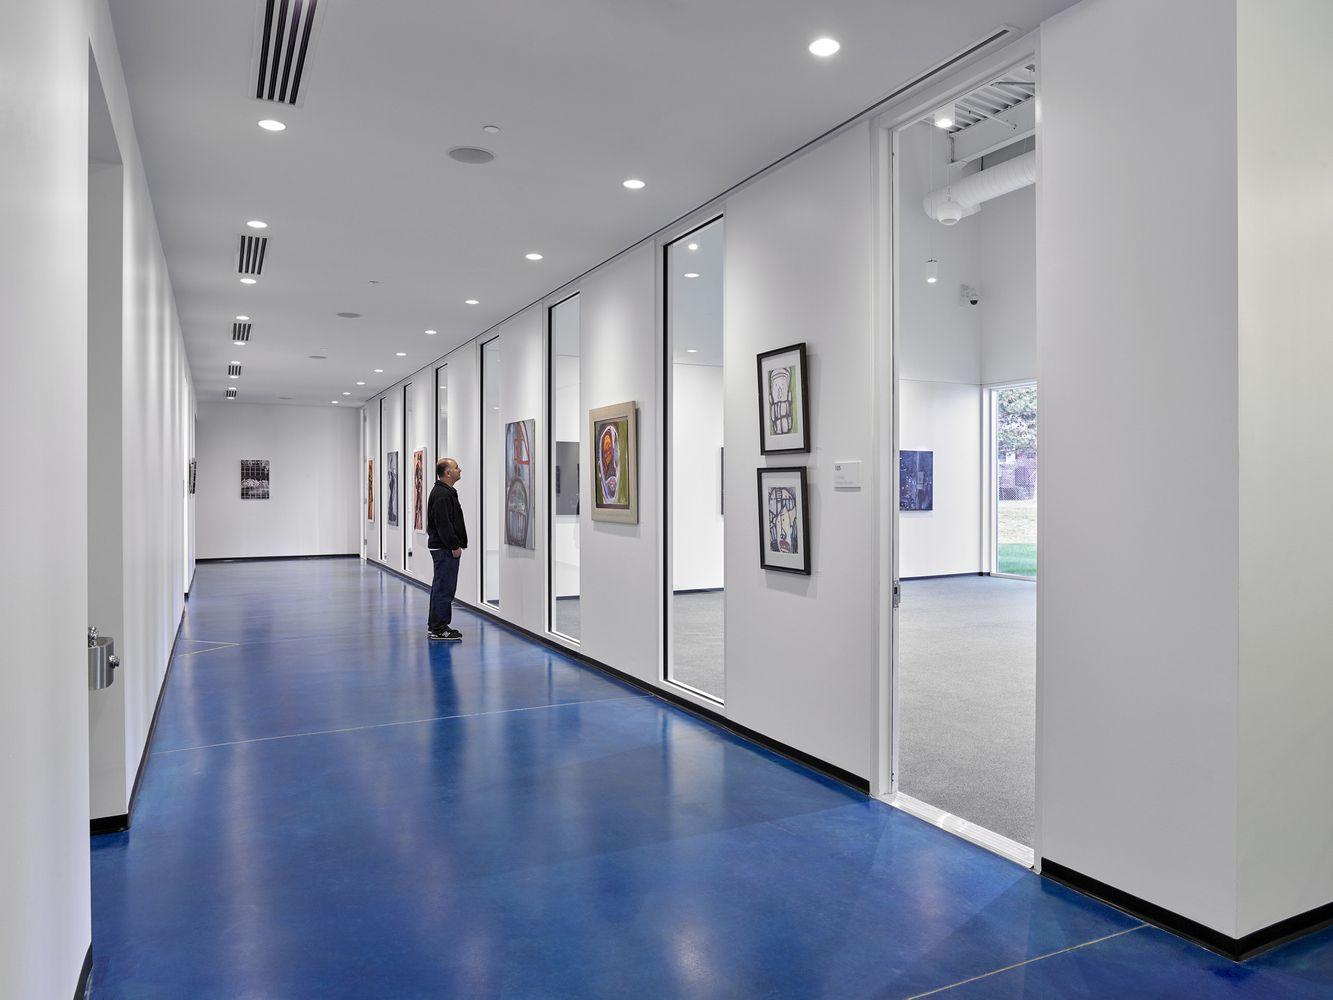 Gallery Of Trec Newark Housing Authority Ikon 5 Architects 8 Corporate Interiors Architect Glass Facades